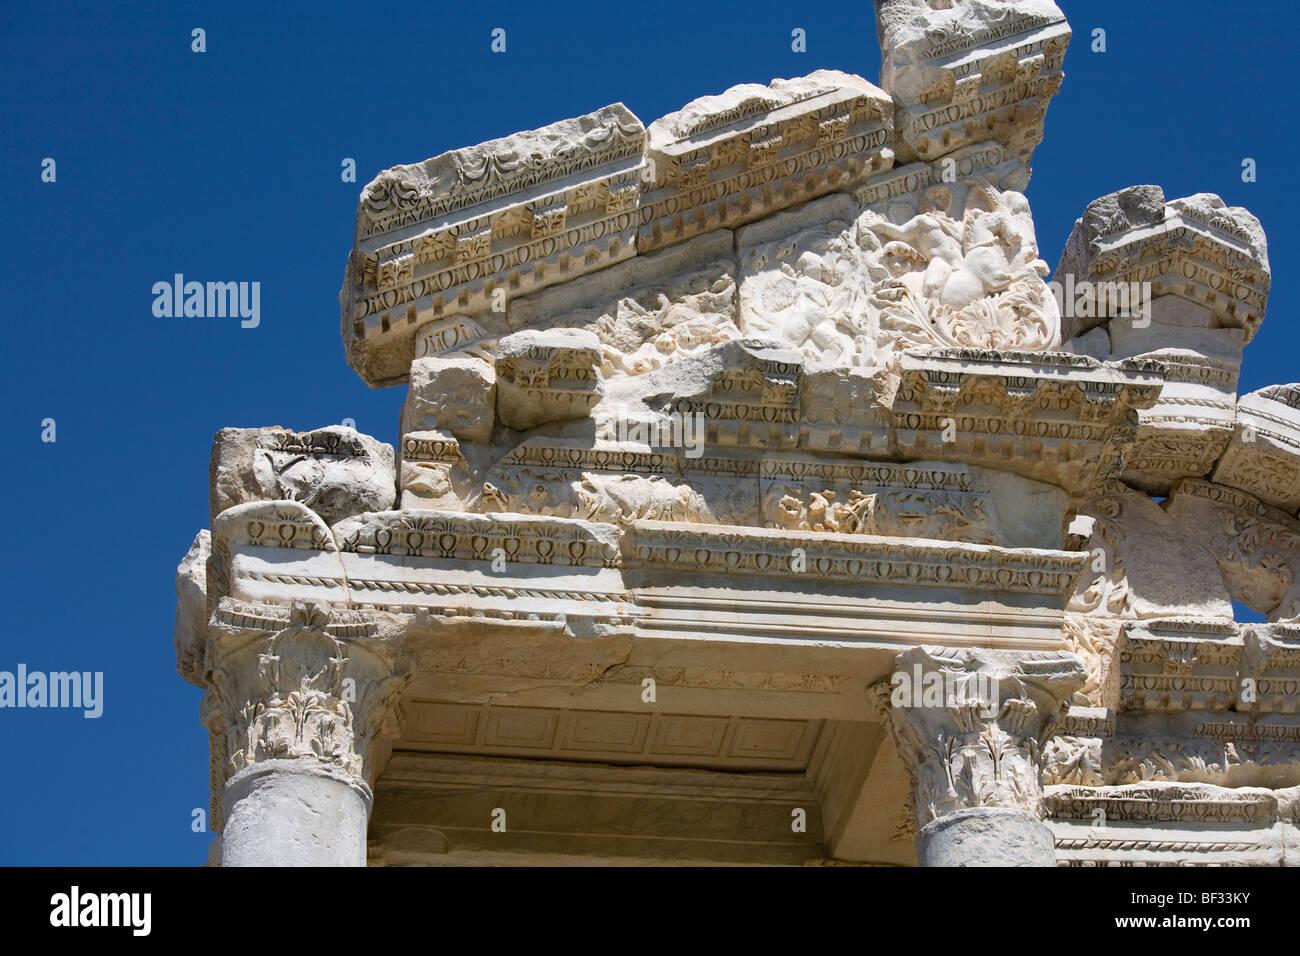 Turkey, Aphrodisias - Tetrapylon, western pediment, north end, decorative entablature - Stock Image